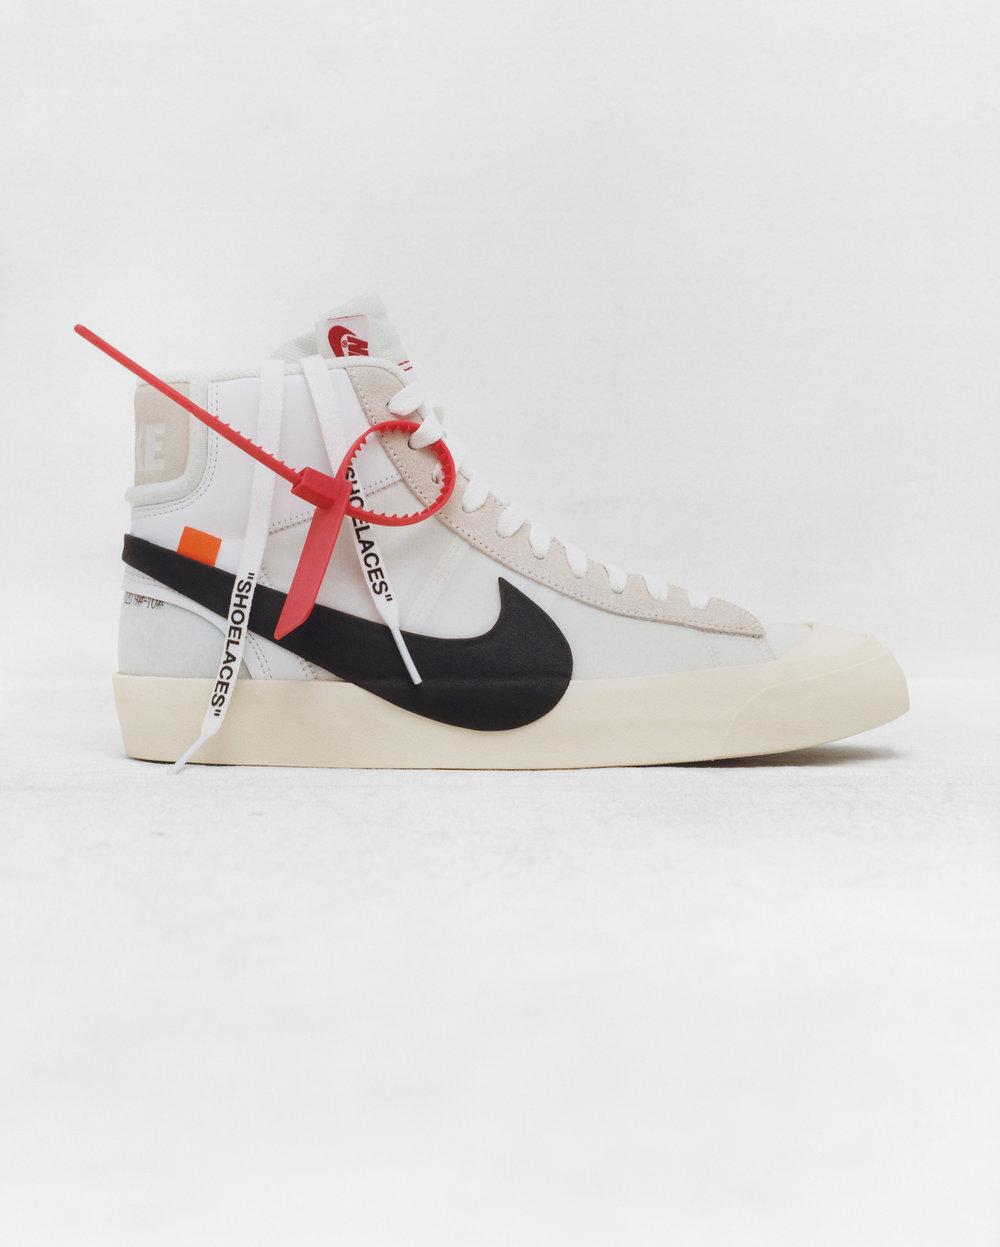 Virgil-Abloh-Nike-The10-7_73194.jpg